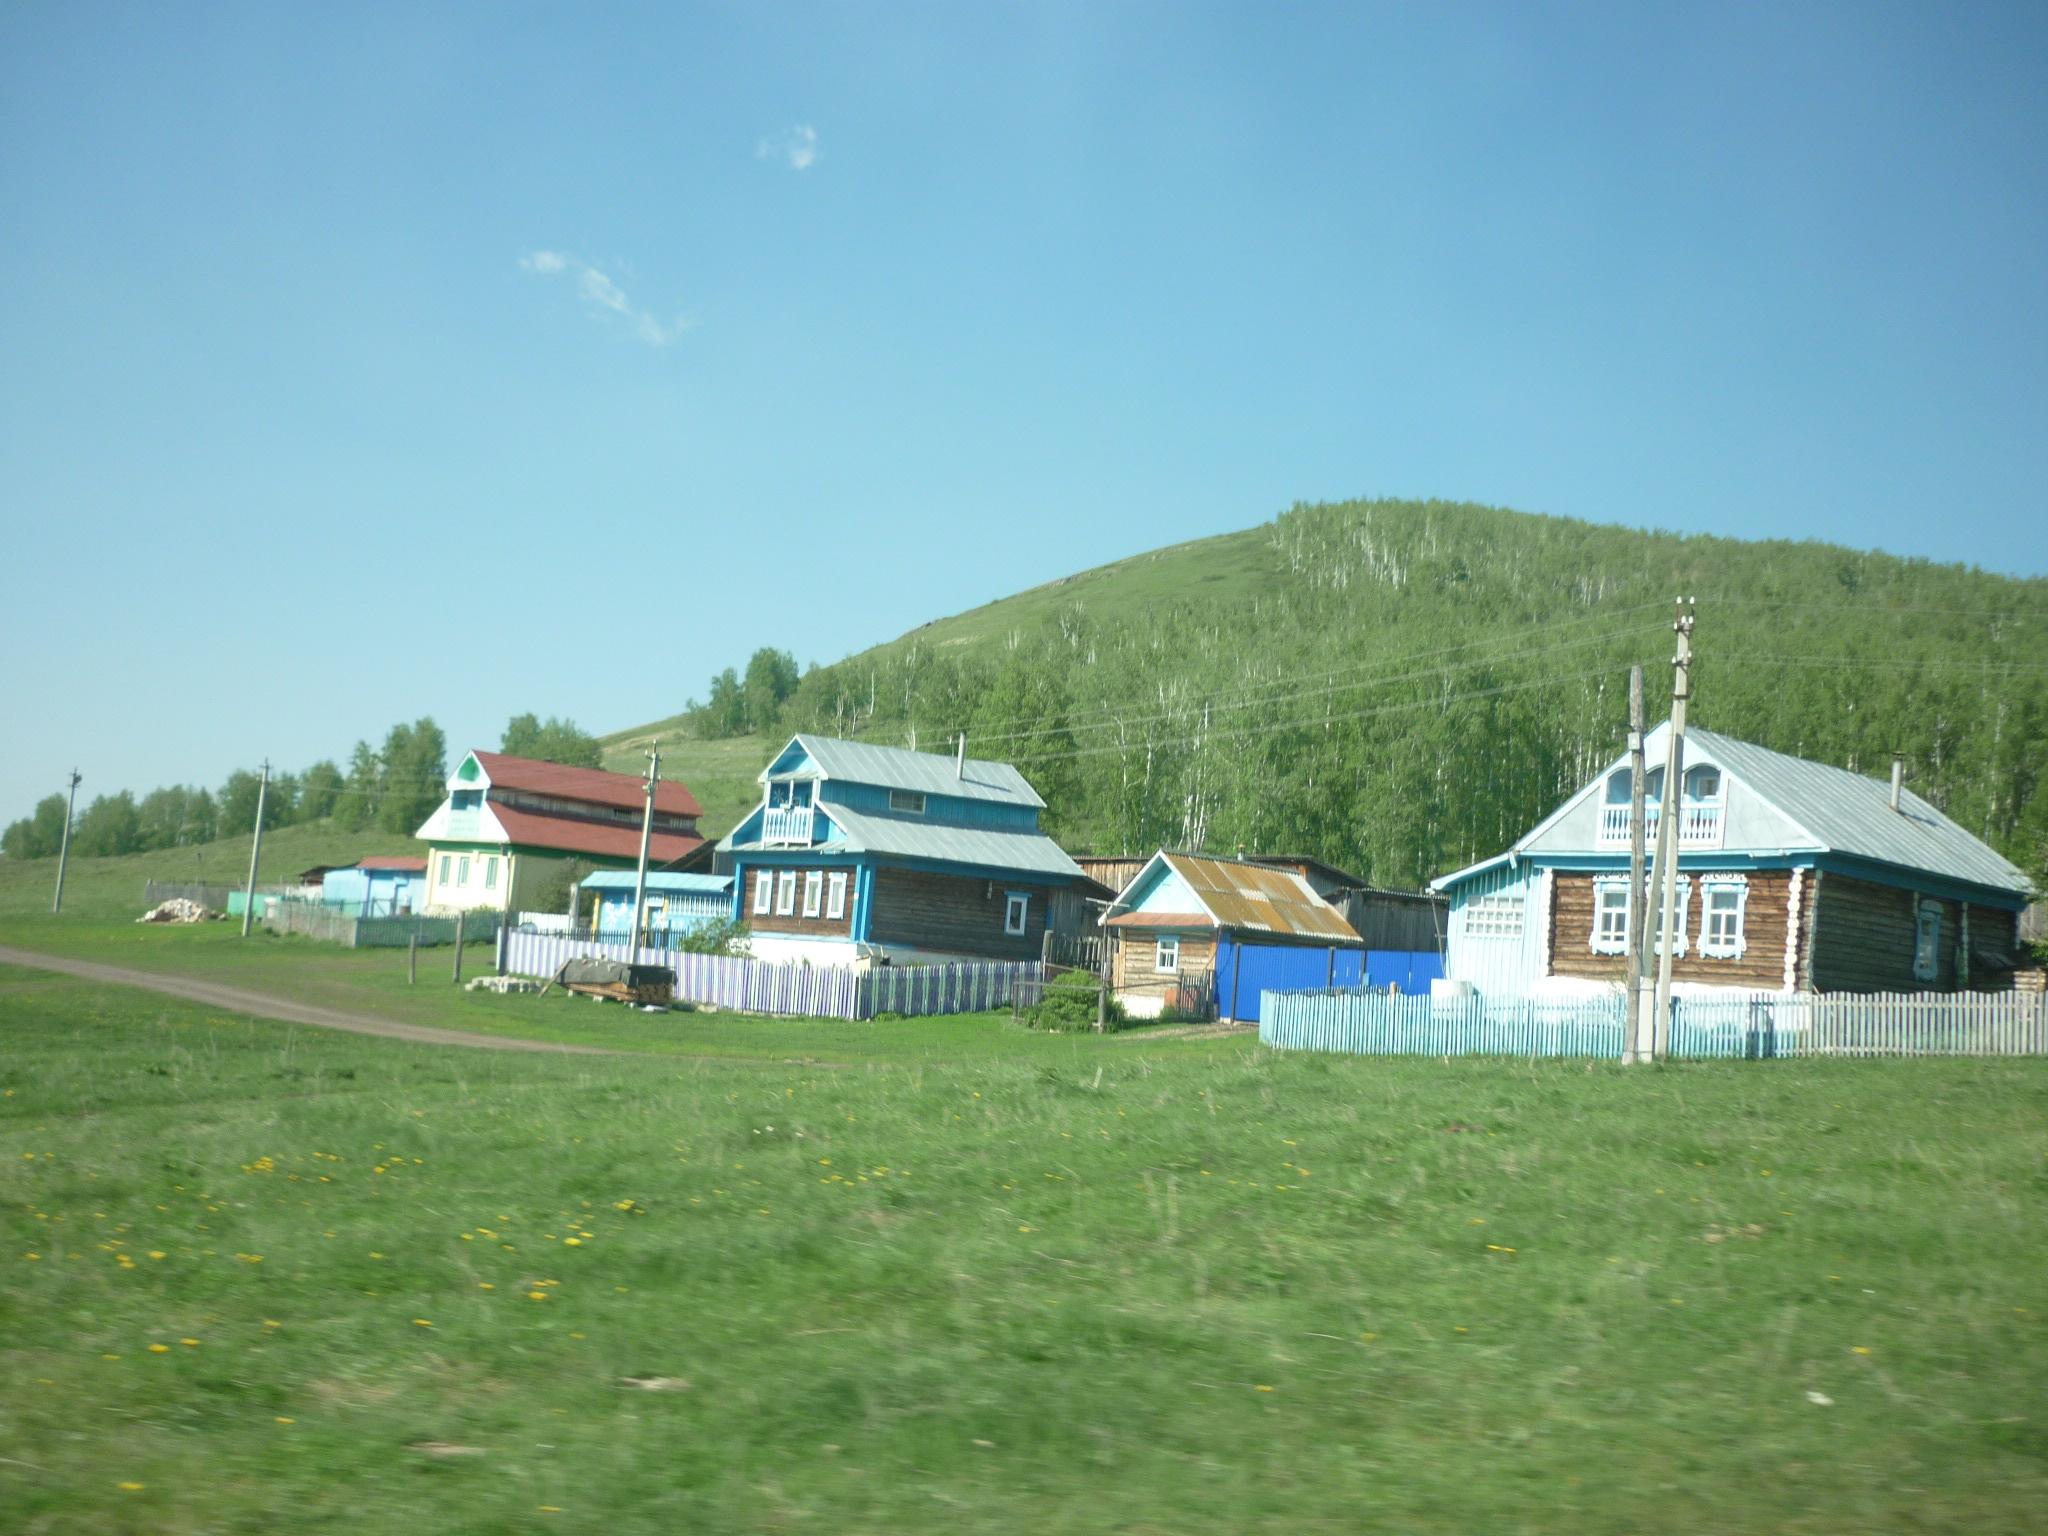 Деревня возле озера Аушкуль (03.07.2015)